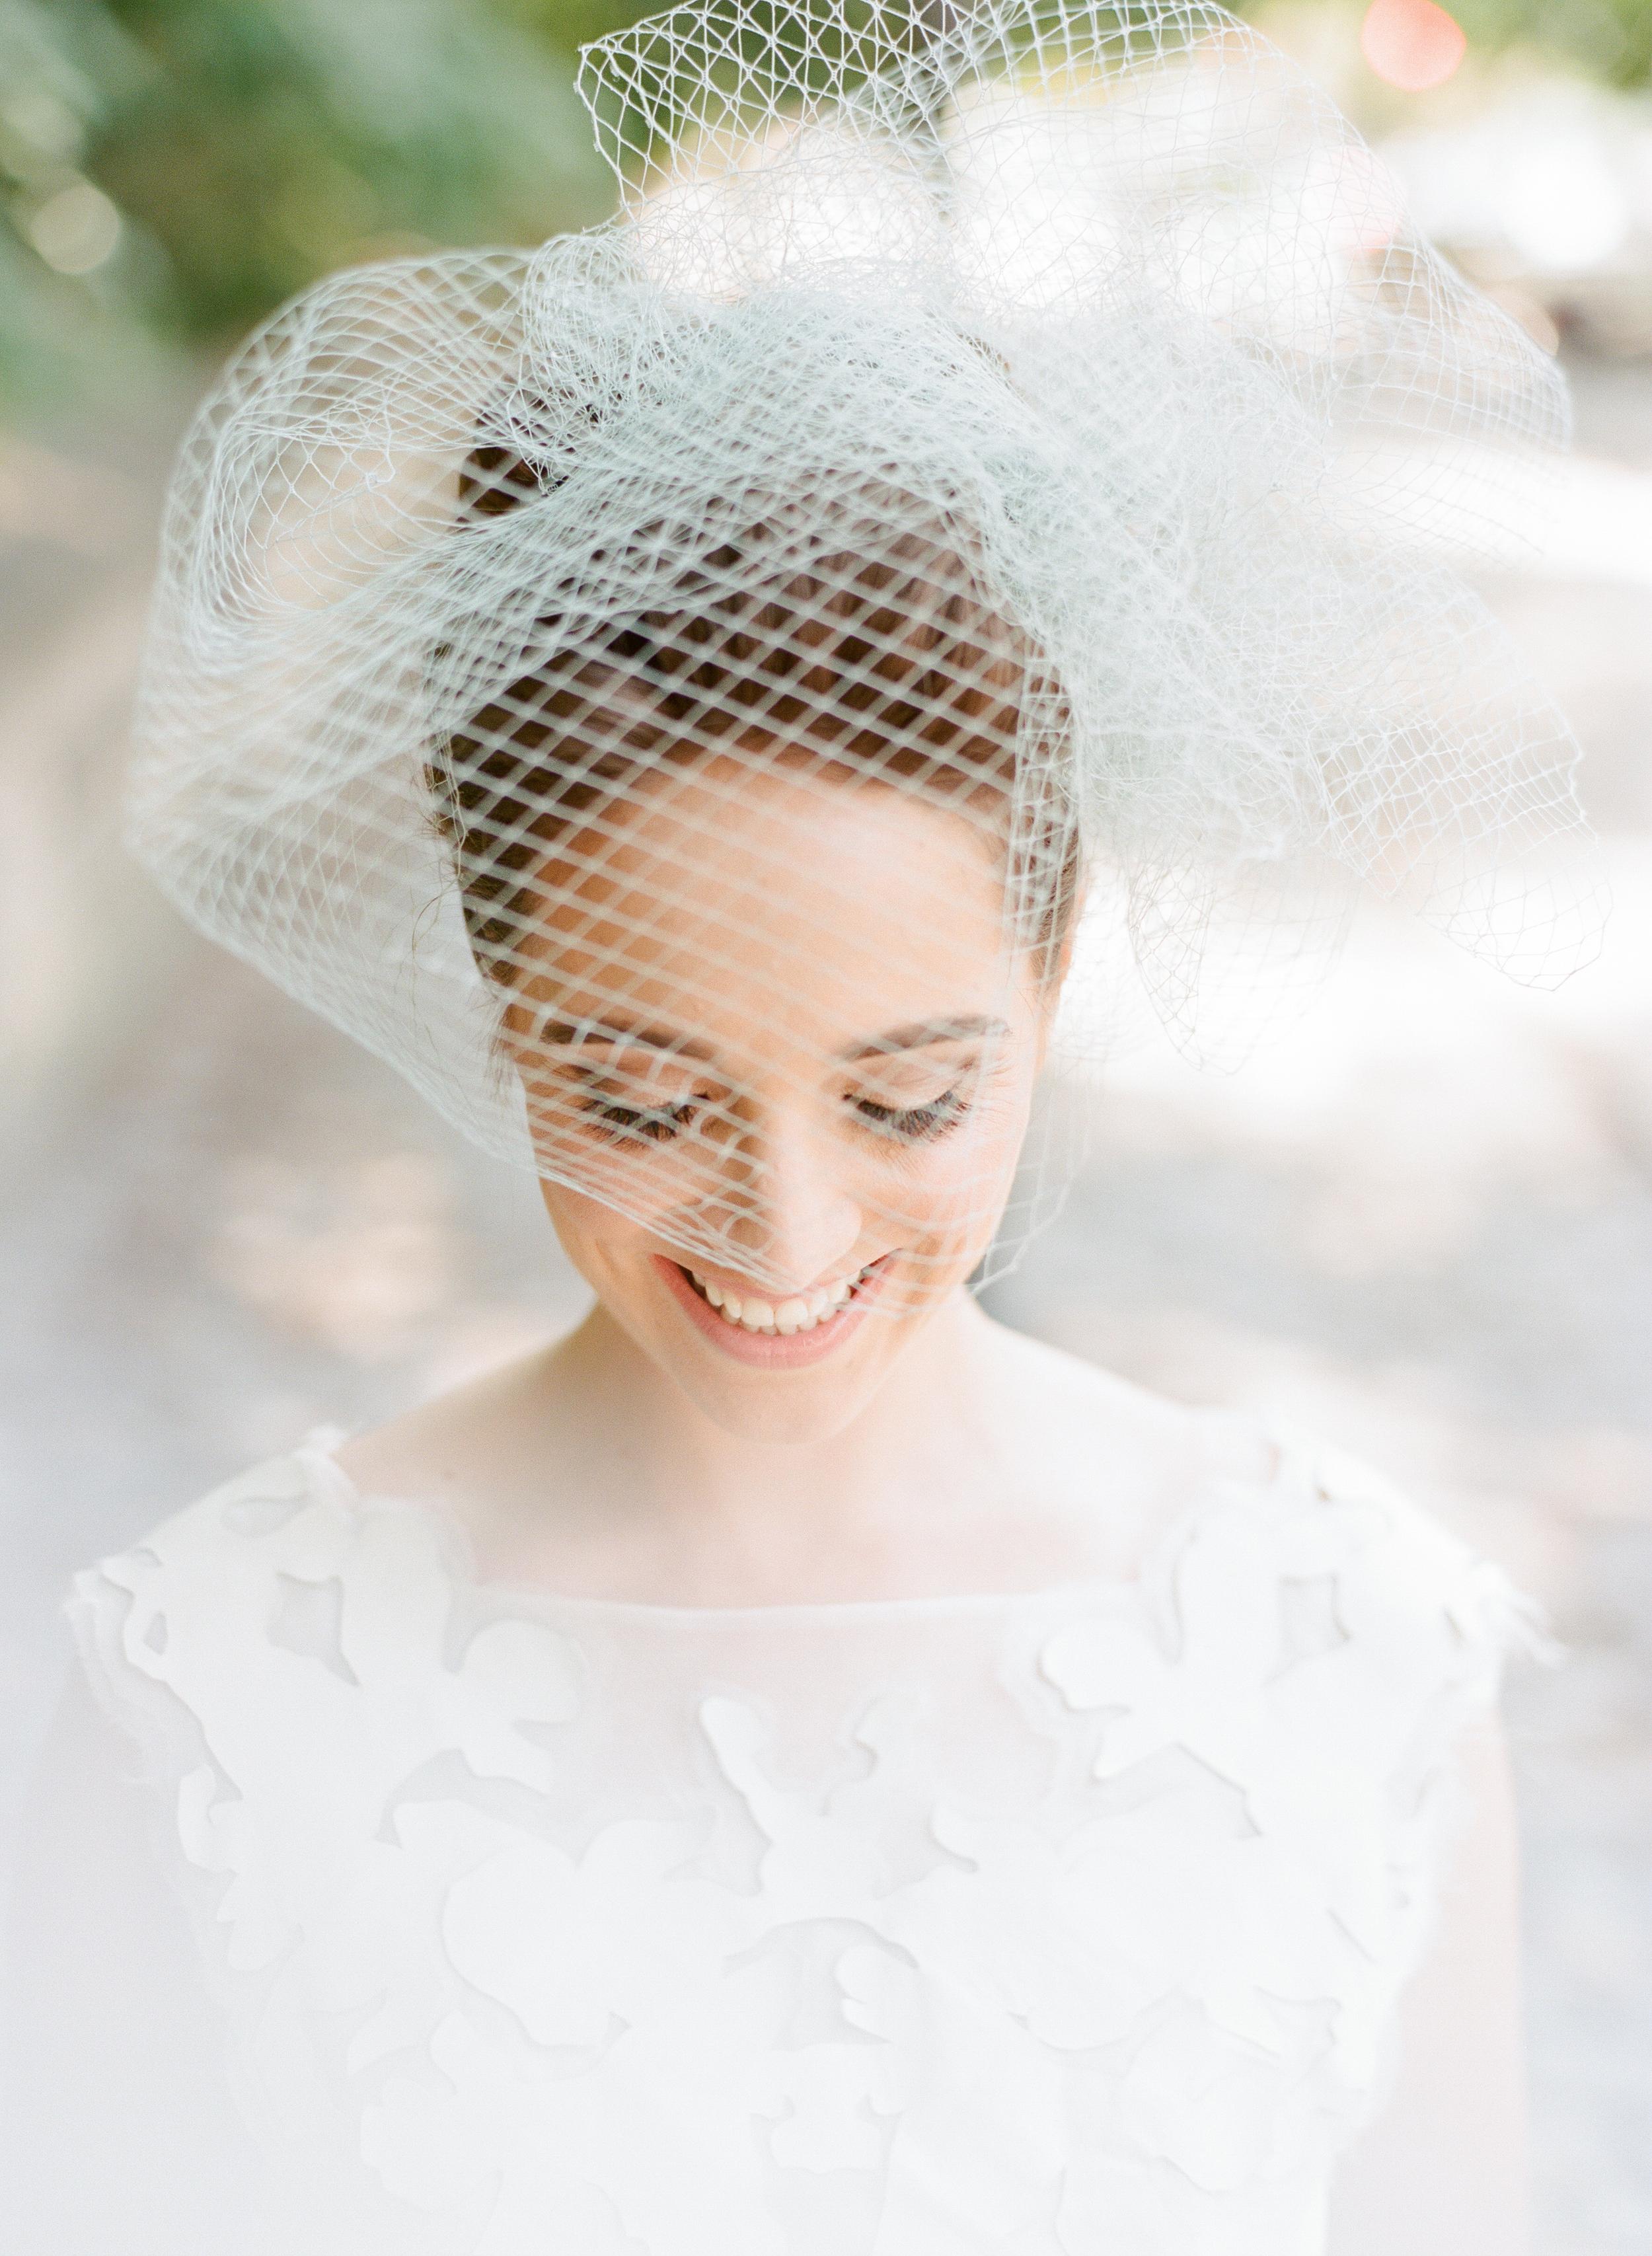 hannah_shih_hanaluluco_cj_isaac_charlie_juliet_ombre_chambray_prospect_park_brooklyn_wedding_3.jpg